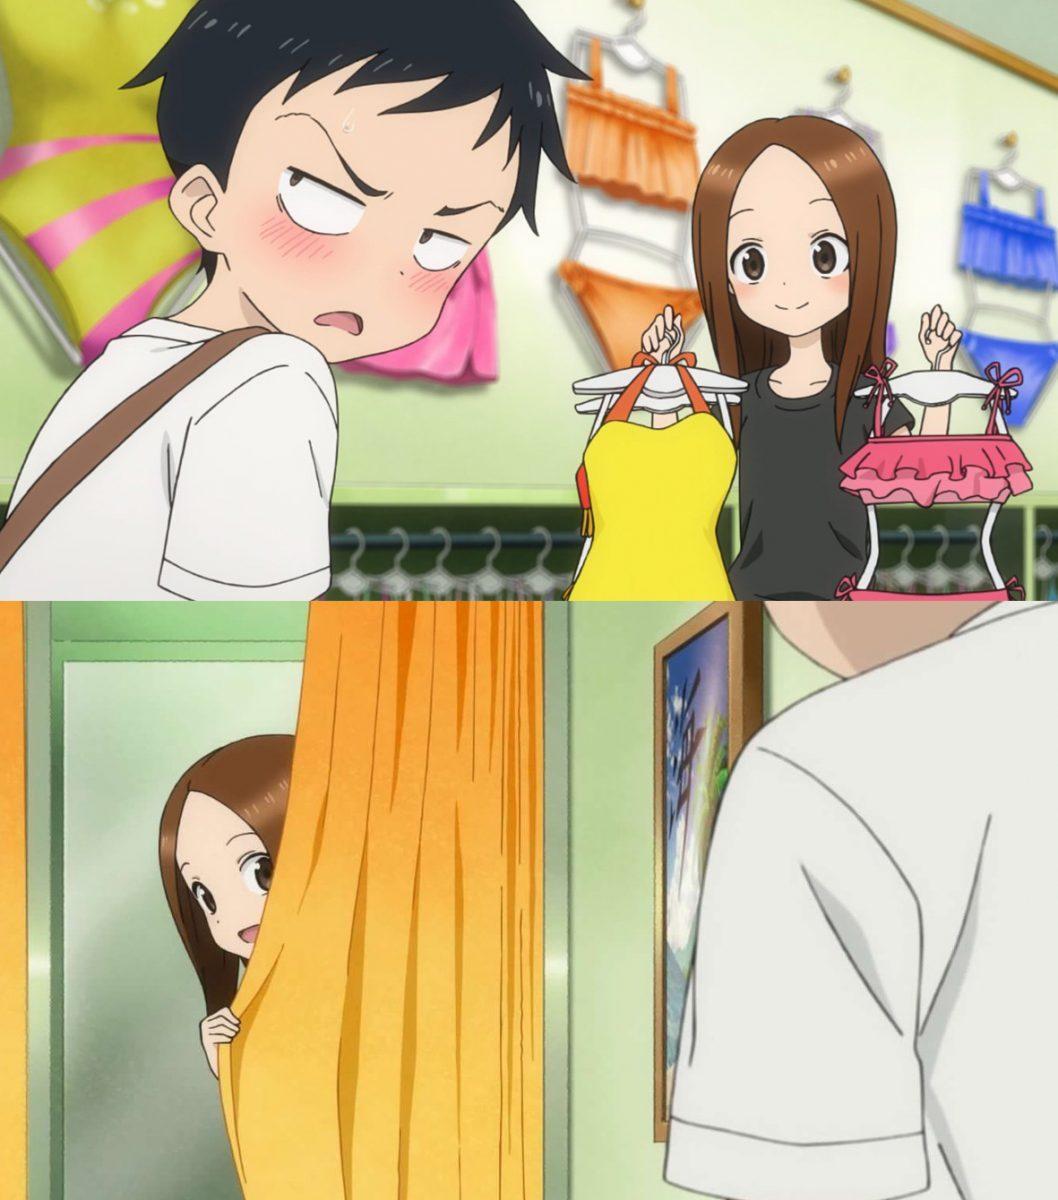 How to troll your crush, by Takagi-san